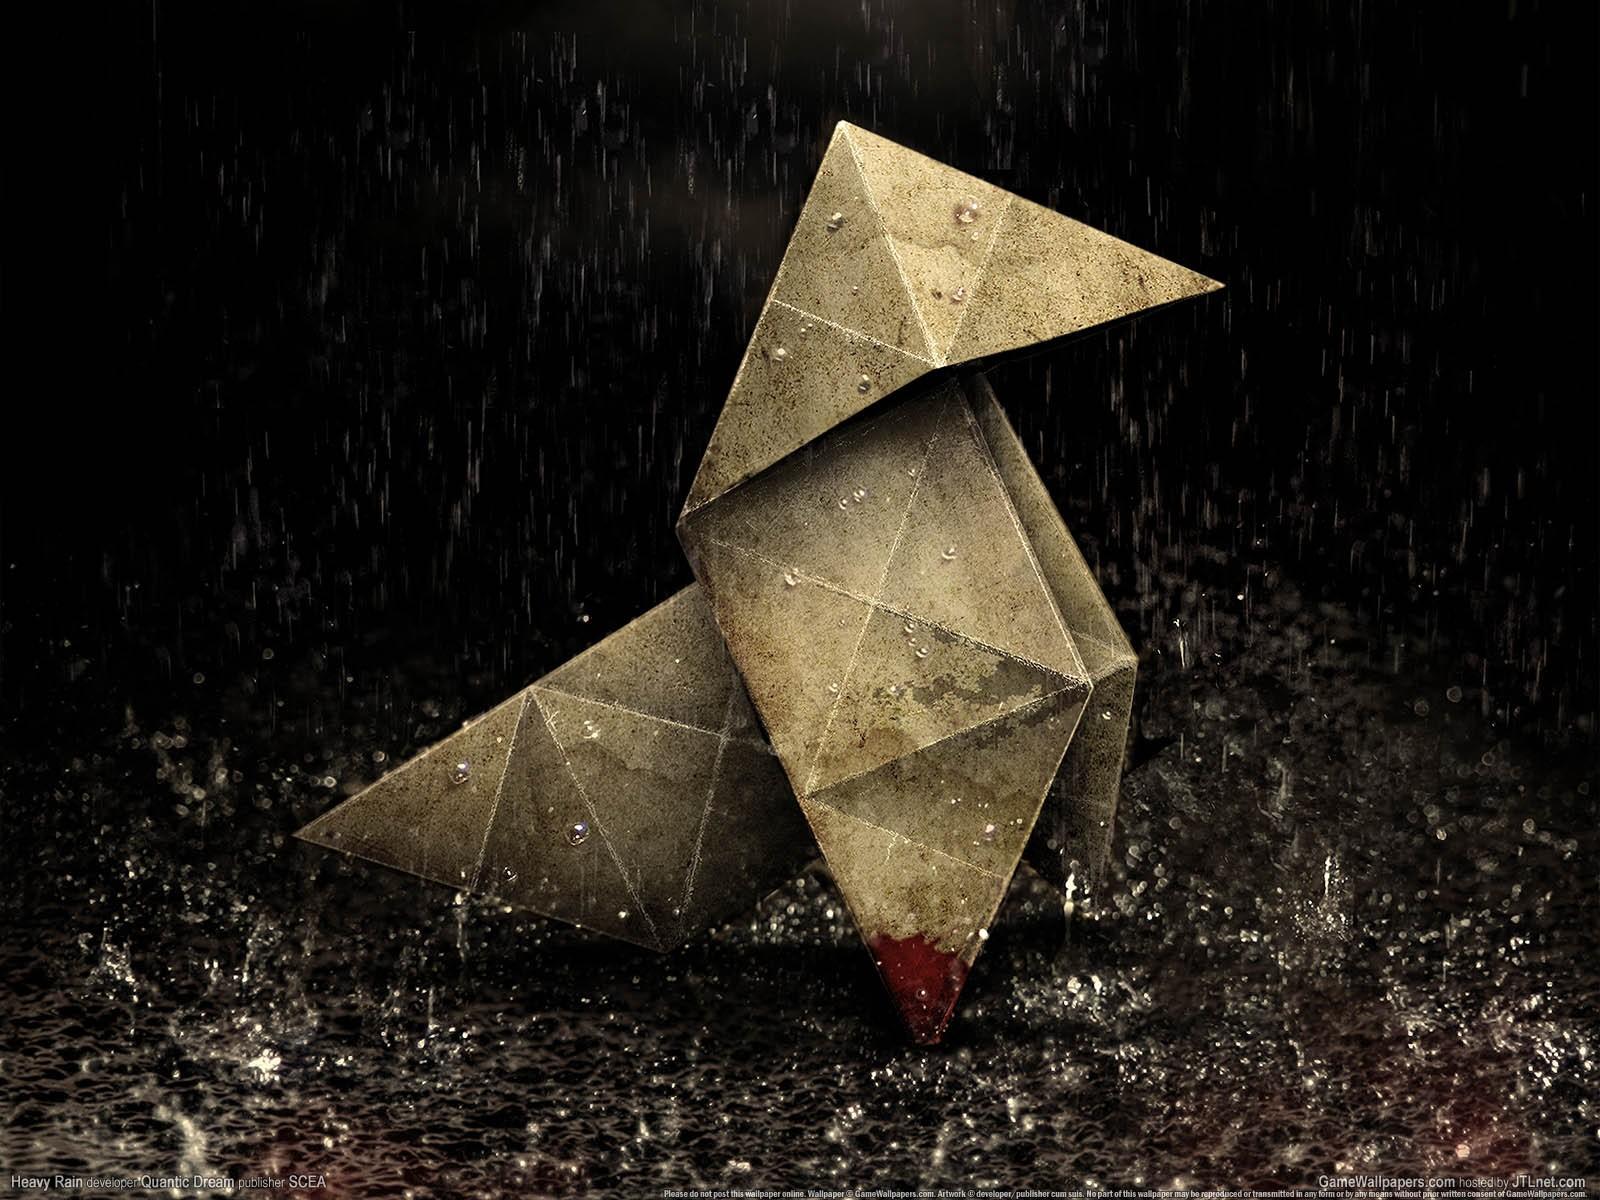 General 1600x1200 origami heavy rain video games blood rain artwork digital art